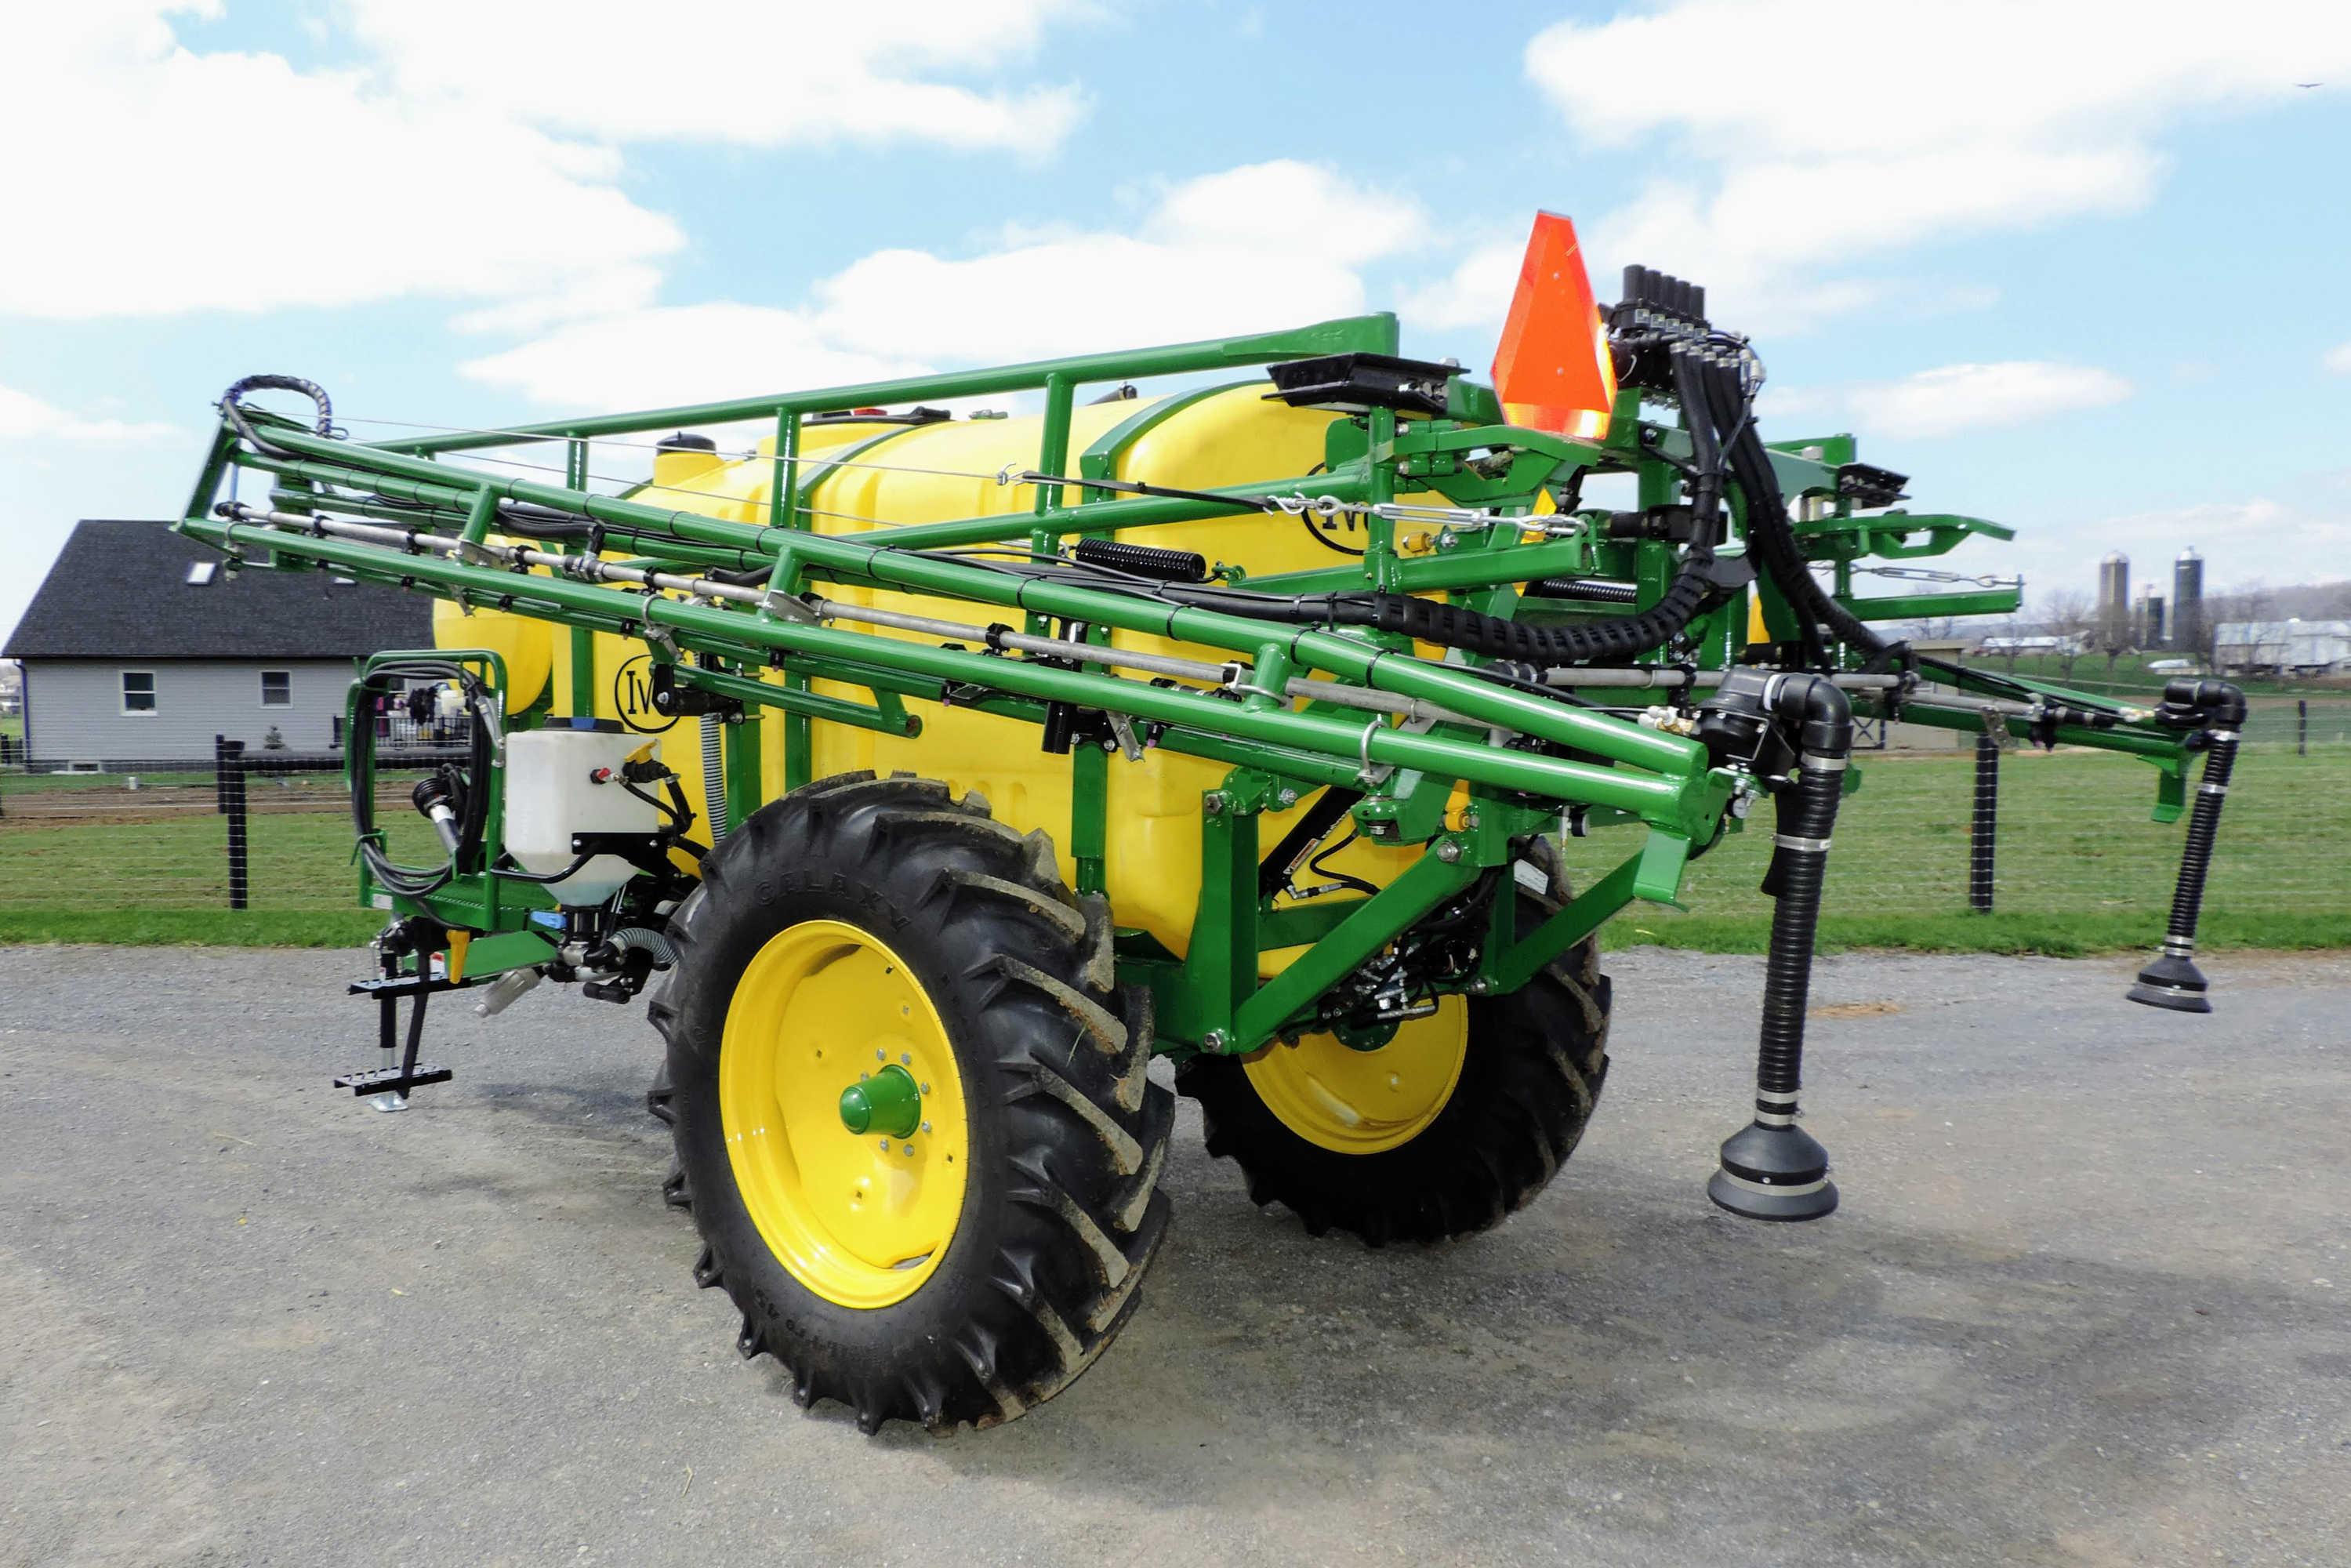 750 gallon Trailer Field Sprayer with 60' AirRide Booms